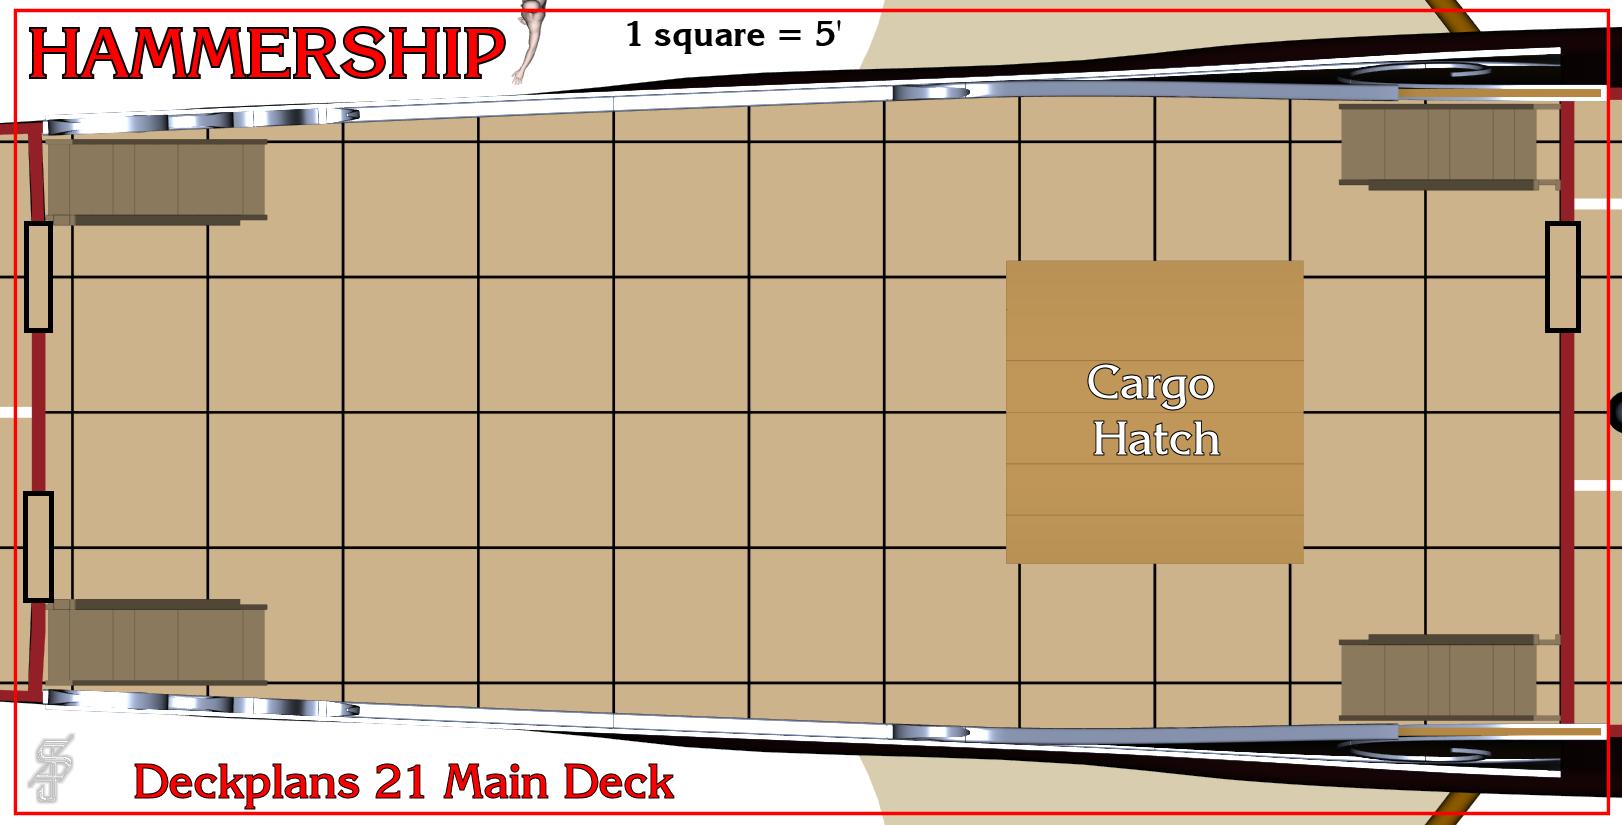 Hammership layout 21